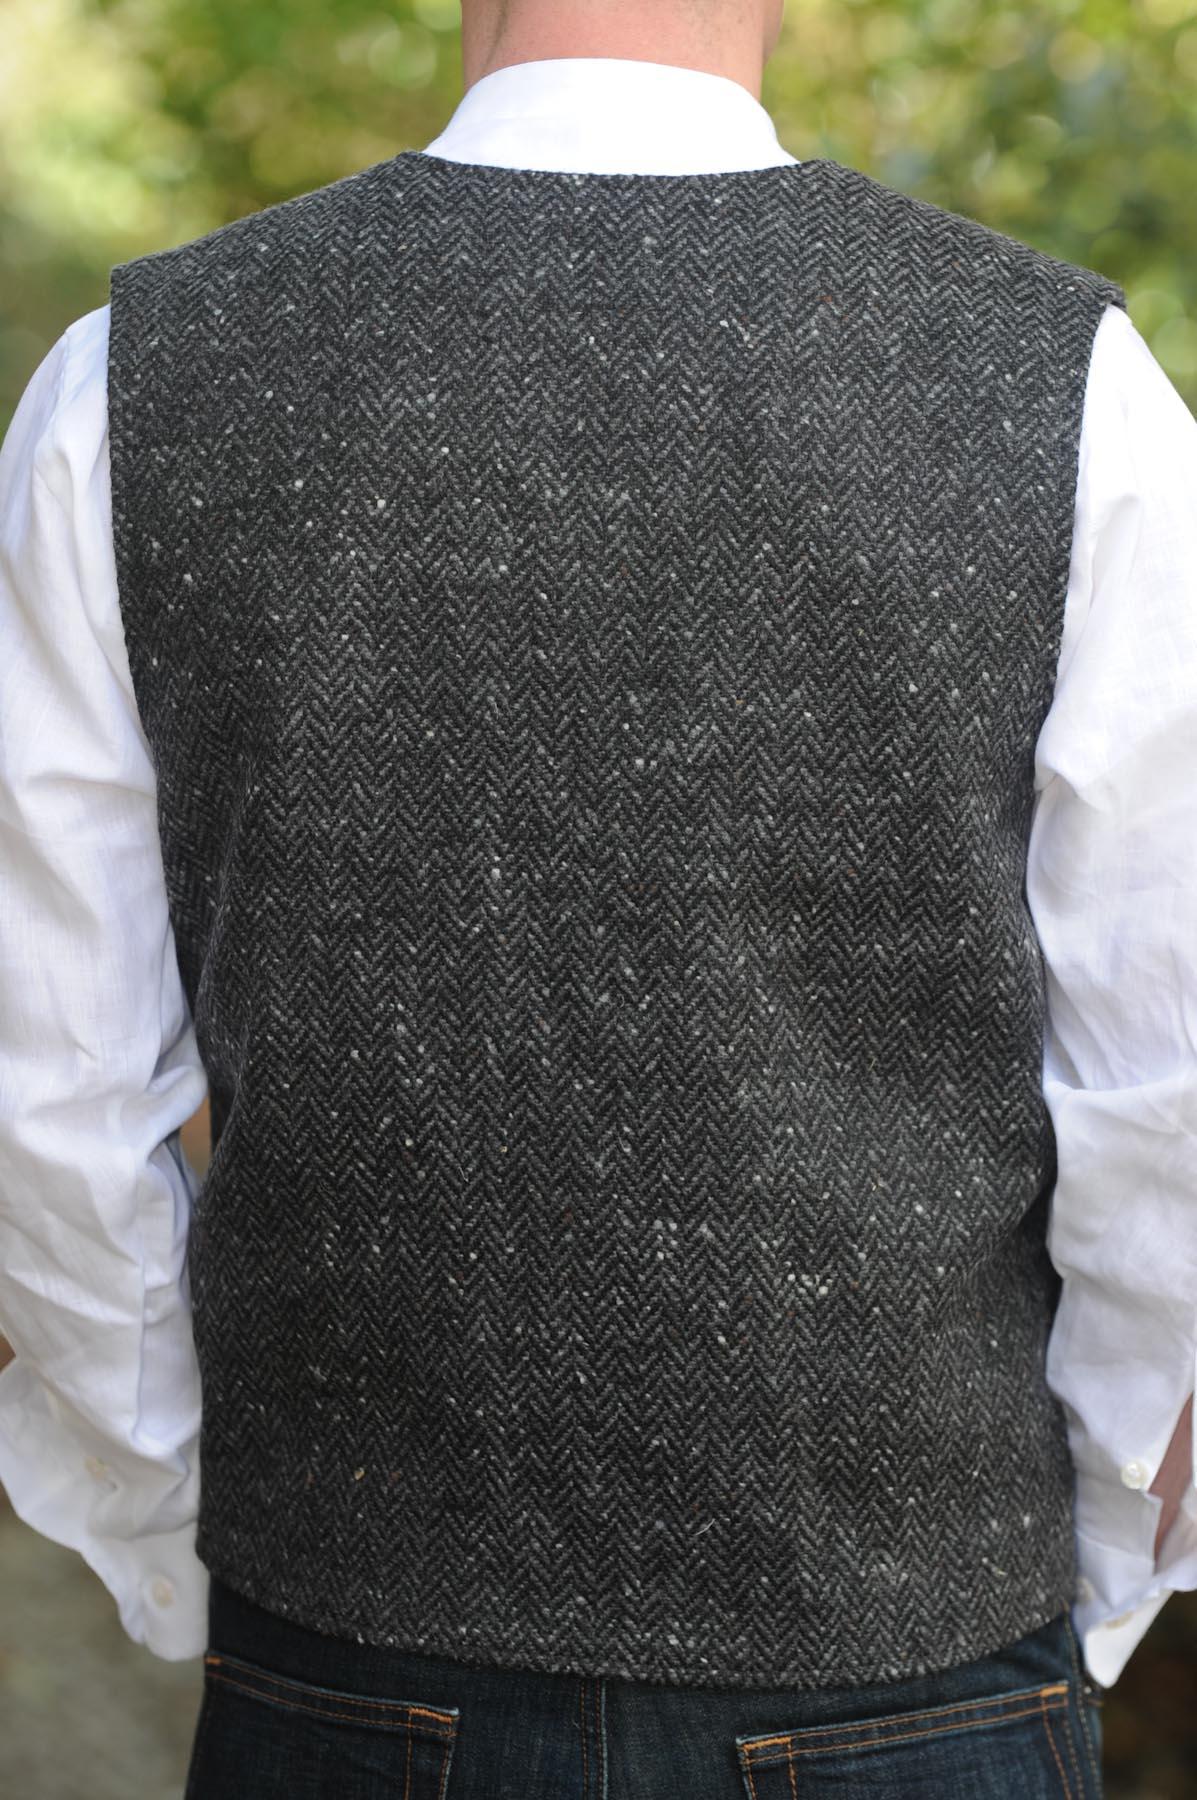 Glengesh Tweedback Waistcoat Charcoal Grey Herringbone